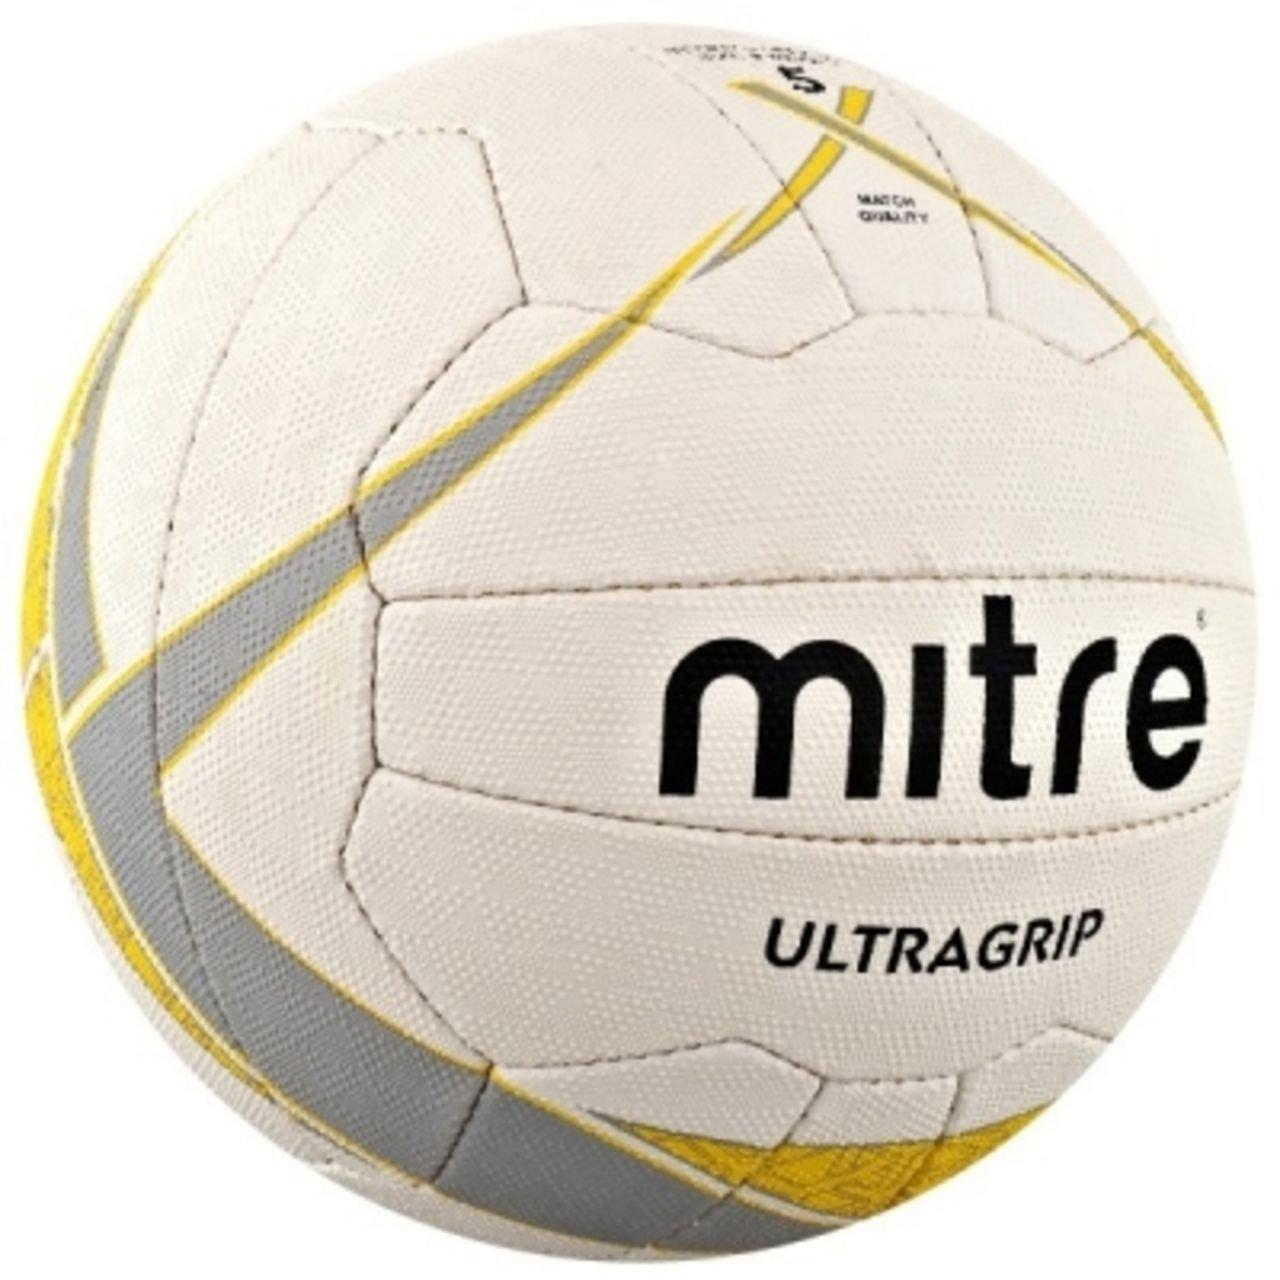 Mitre Ultragripネットボールボール B014YW4TSSSize 5